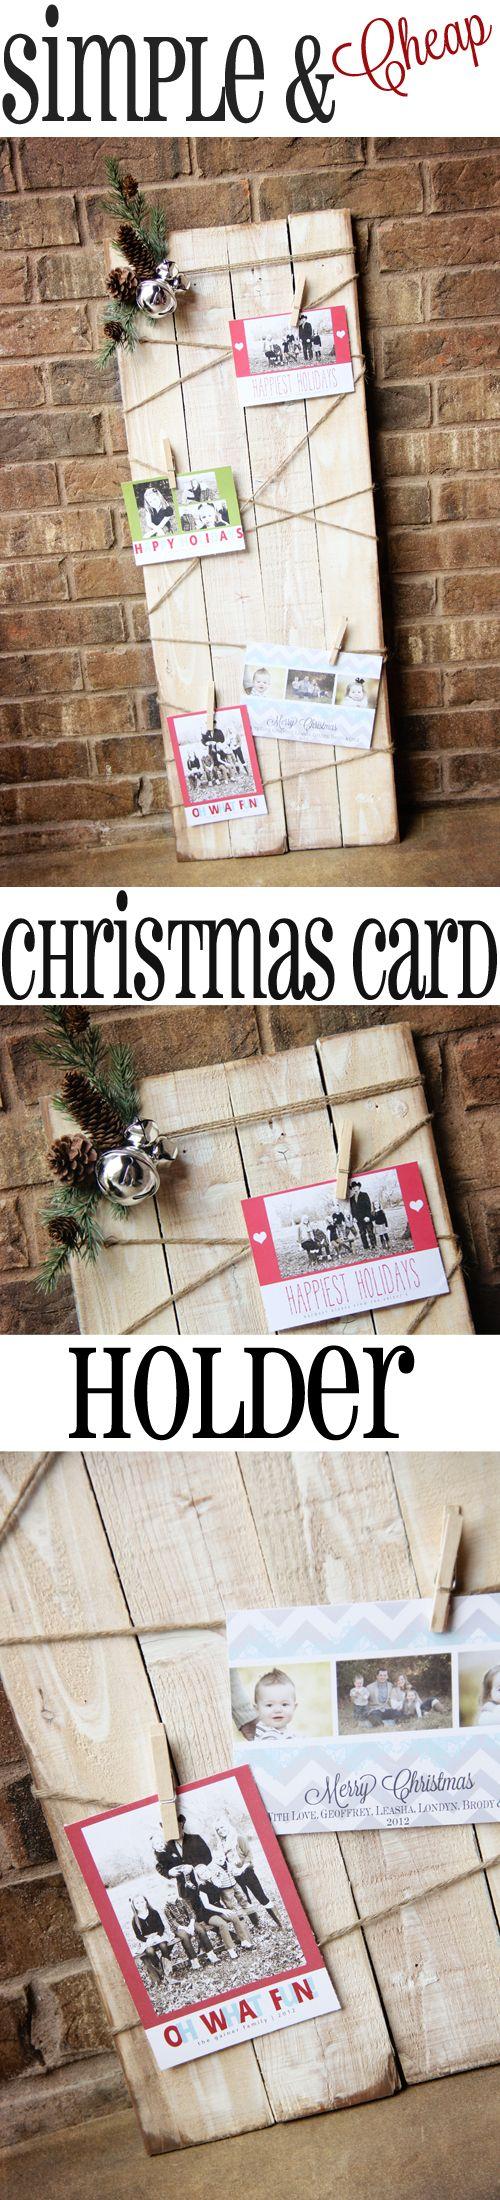 Christmas Card Holder Diy Christmas Card Display Christmas Card Holder Diy Diy Christmas Cards